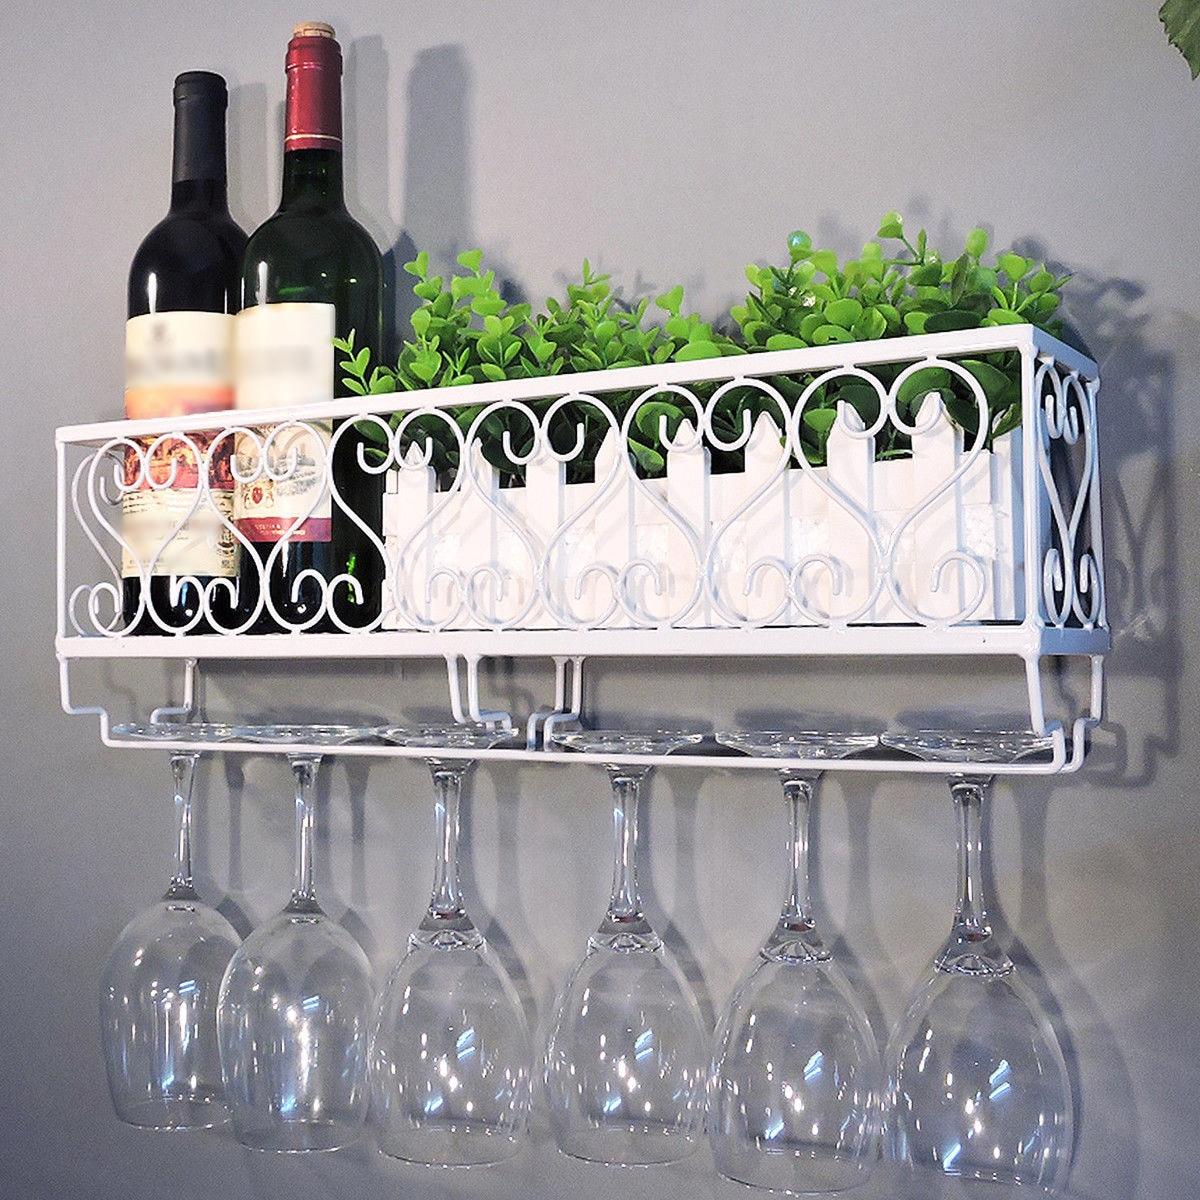 Sansund Wall Mounted Iron Wine Rack Bottle Champagne Glass Holder Shelves Bar Home Party